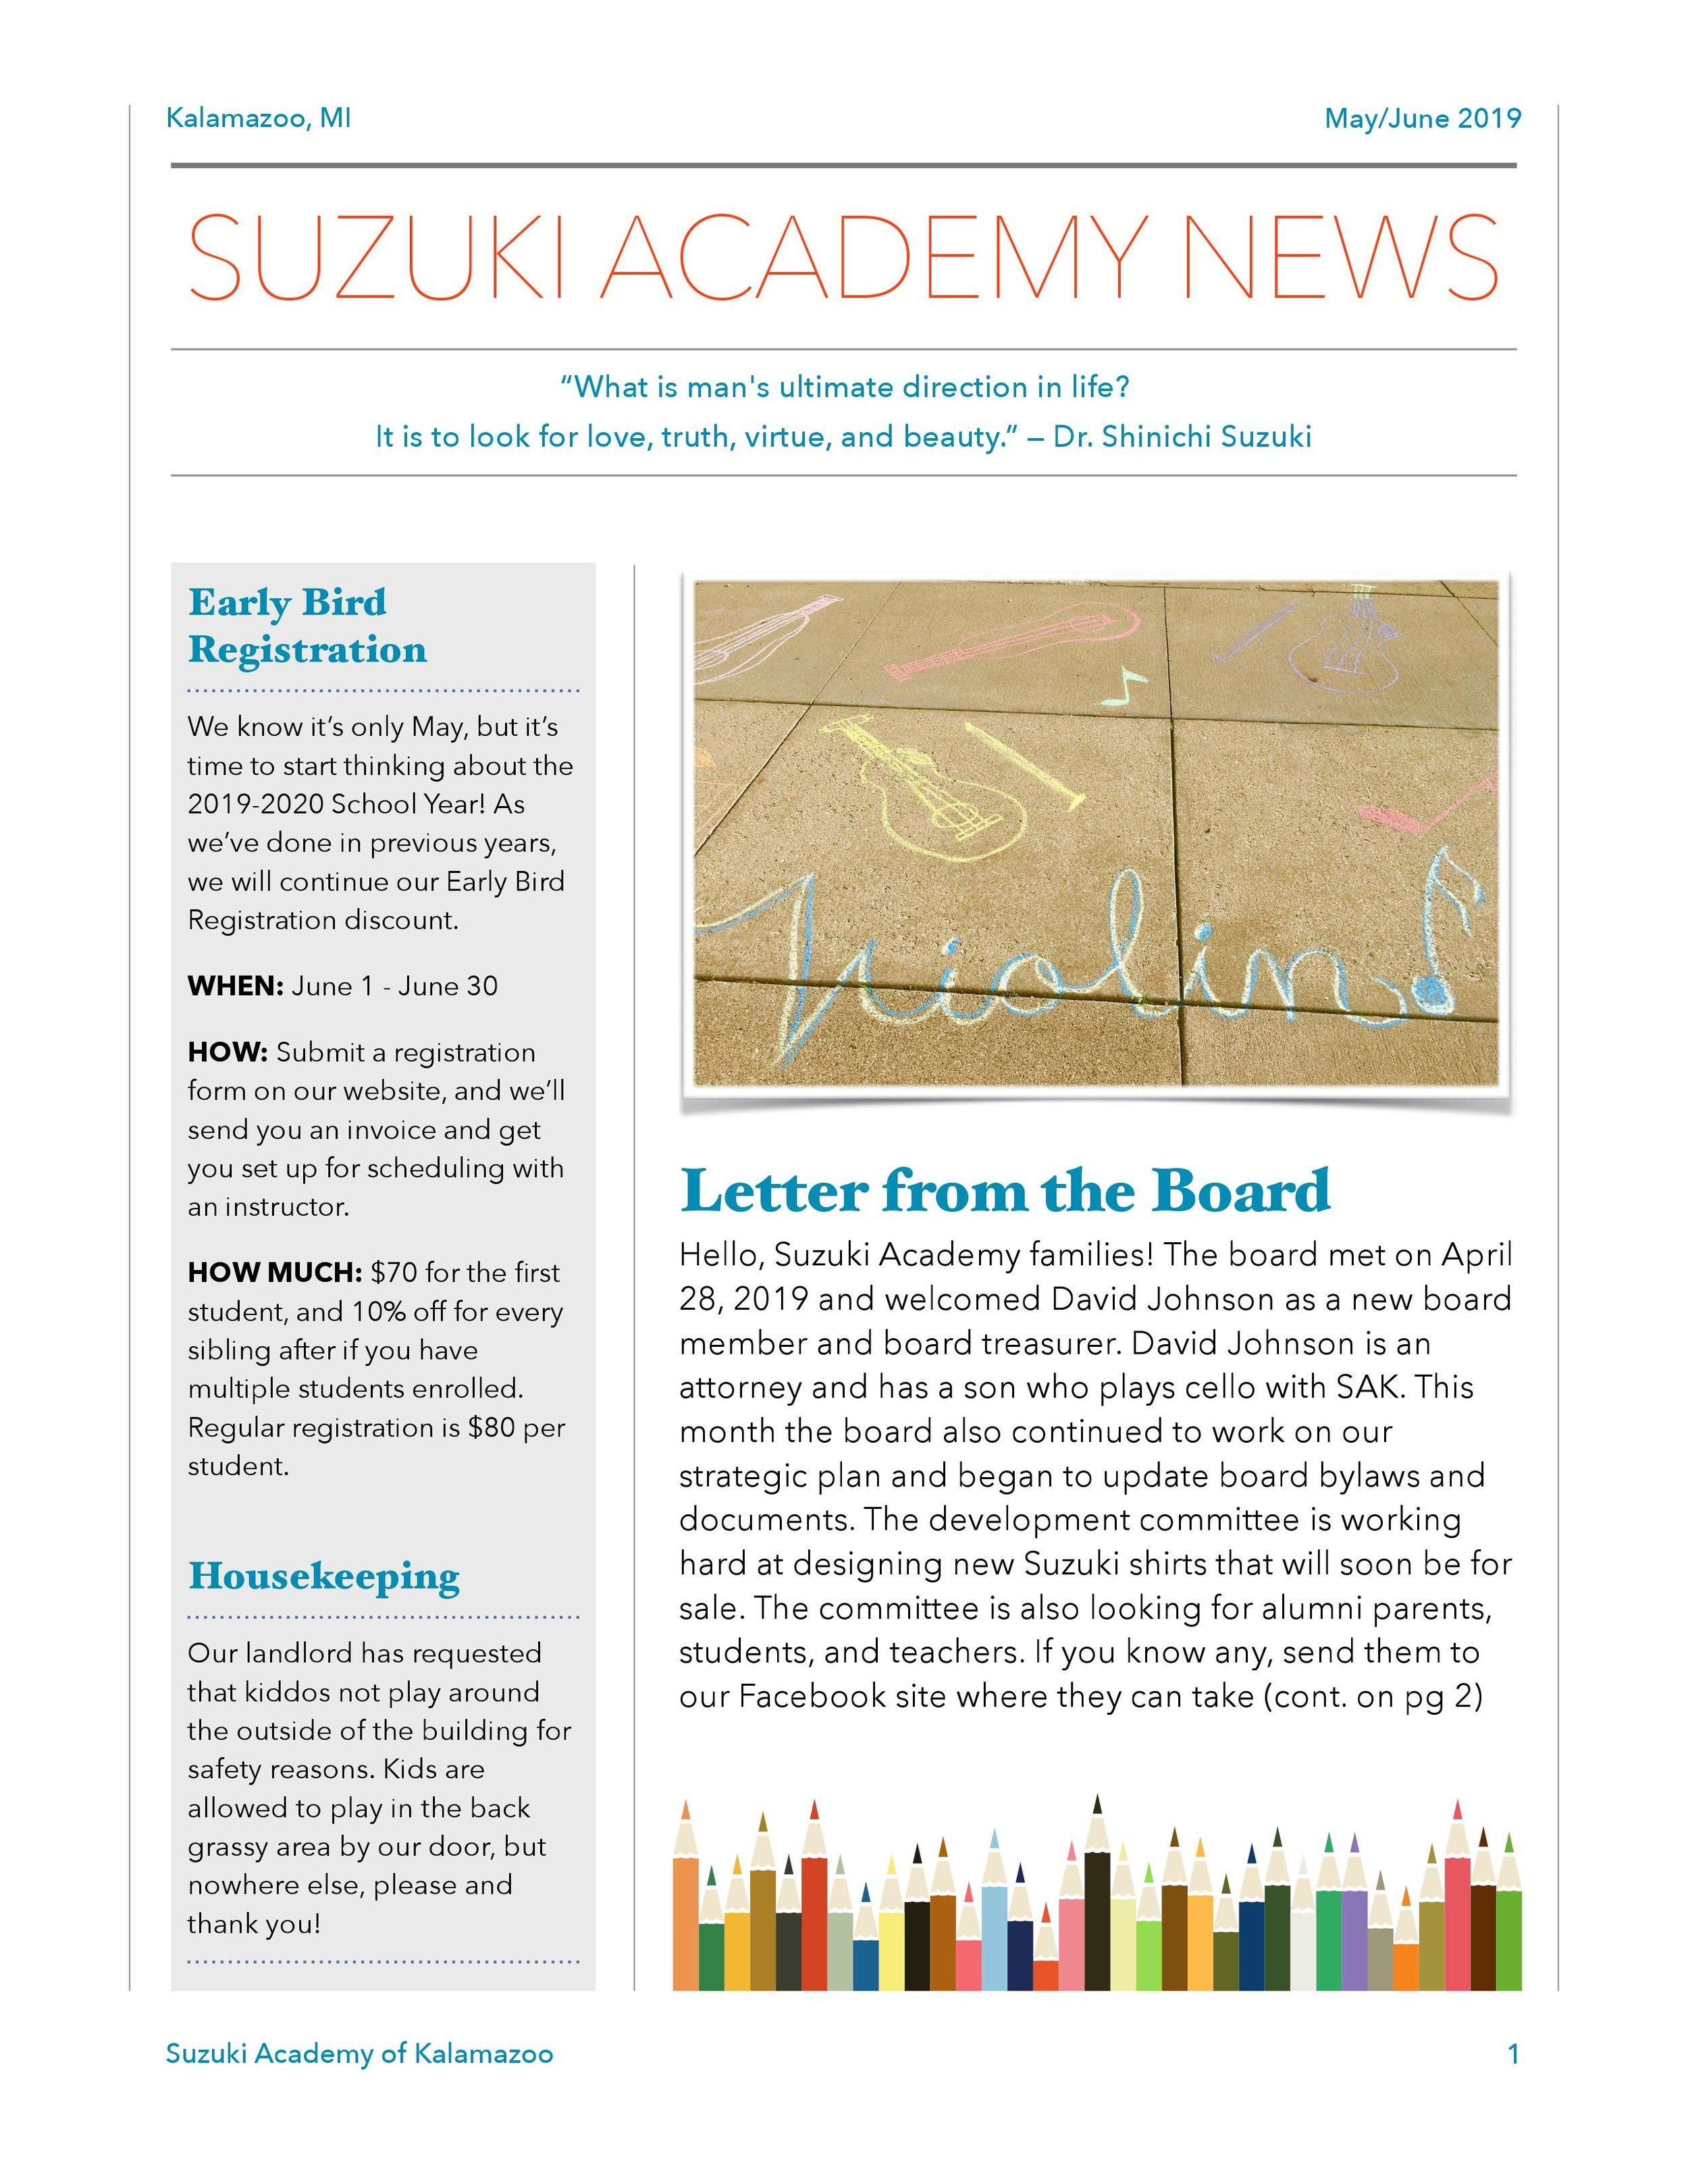 May & June Newsletter — The Suzuki Academy of Kalamazoo